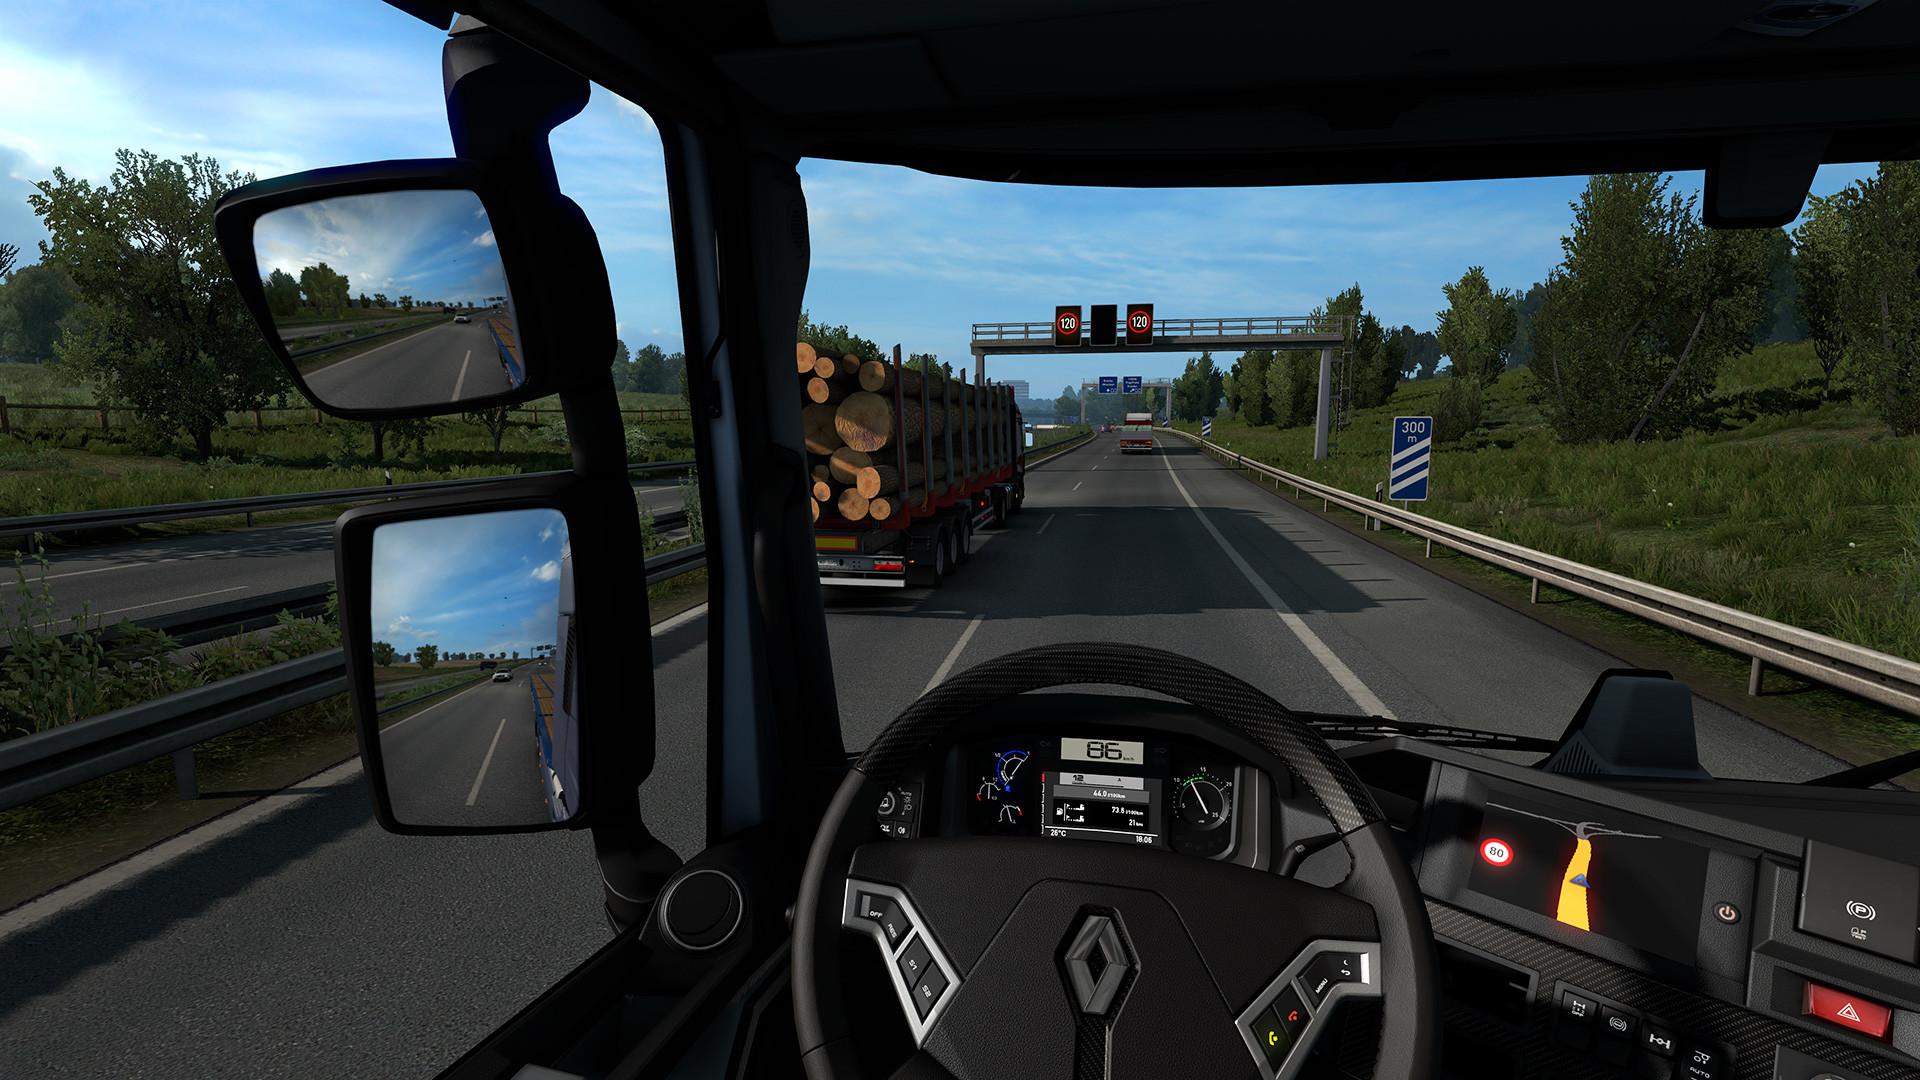 euro-truck-simulator-2-pc-screenshot-03